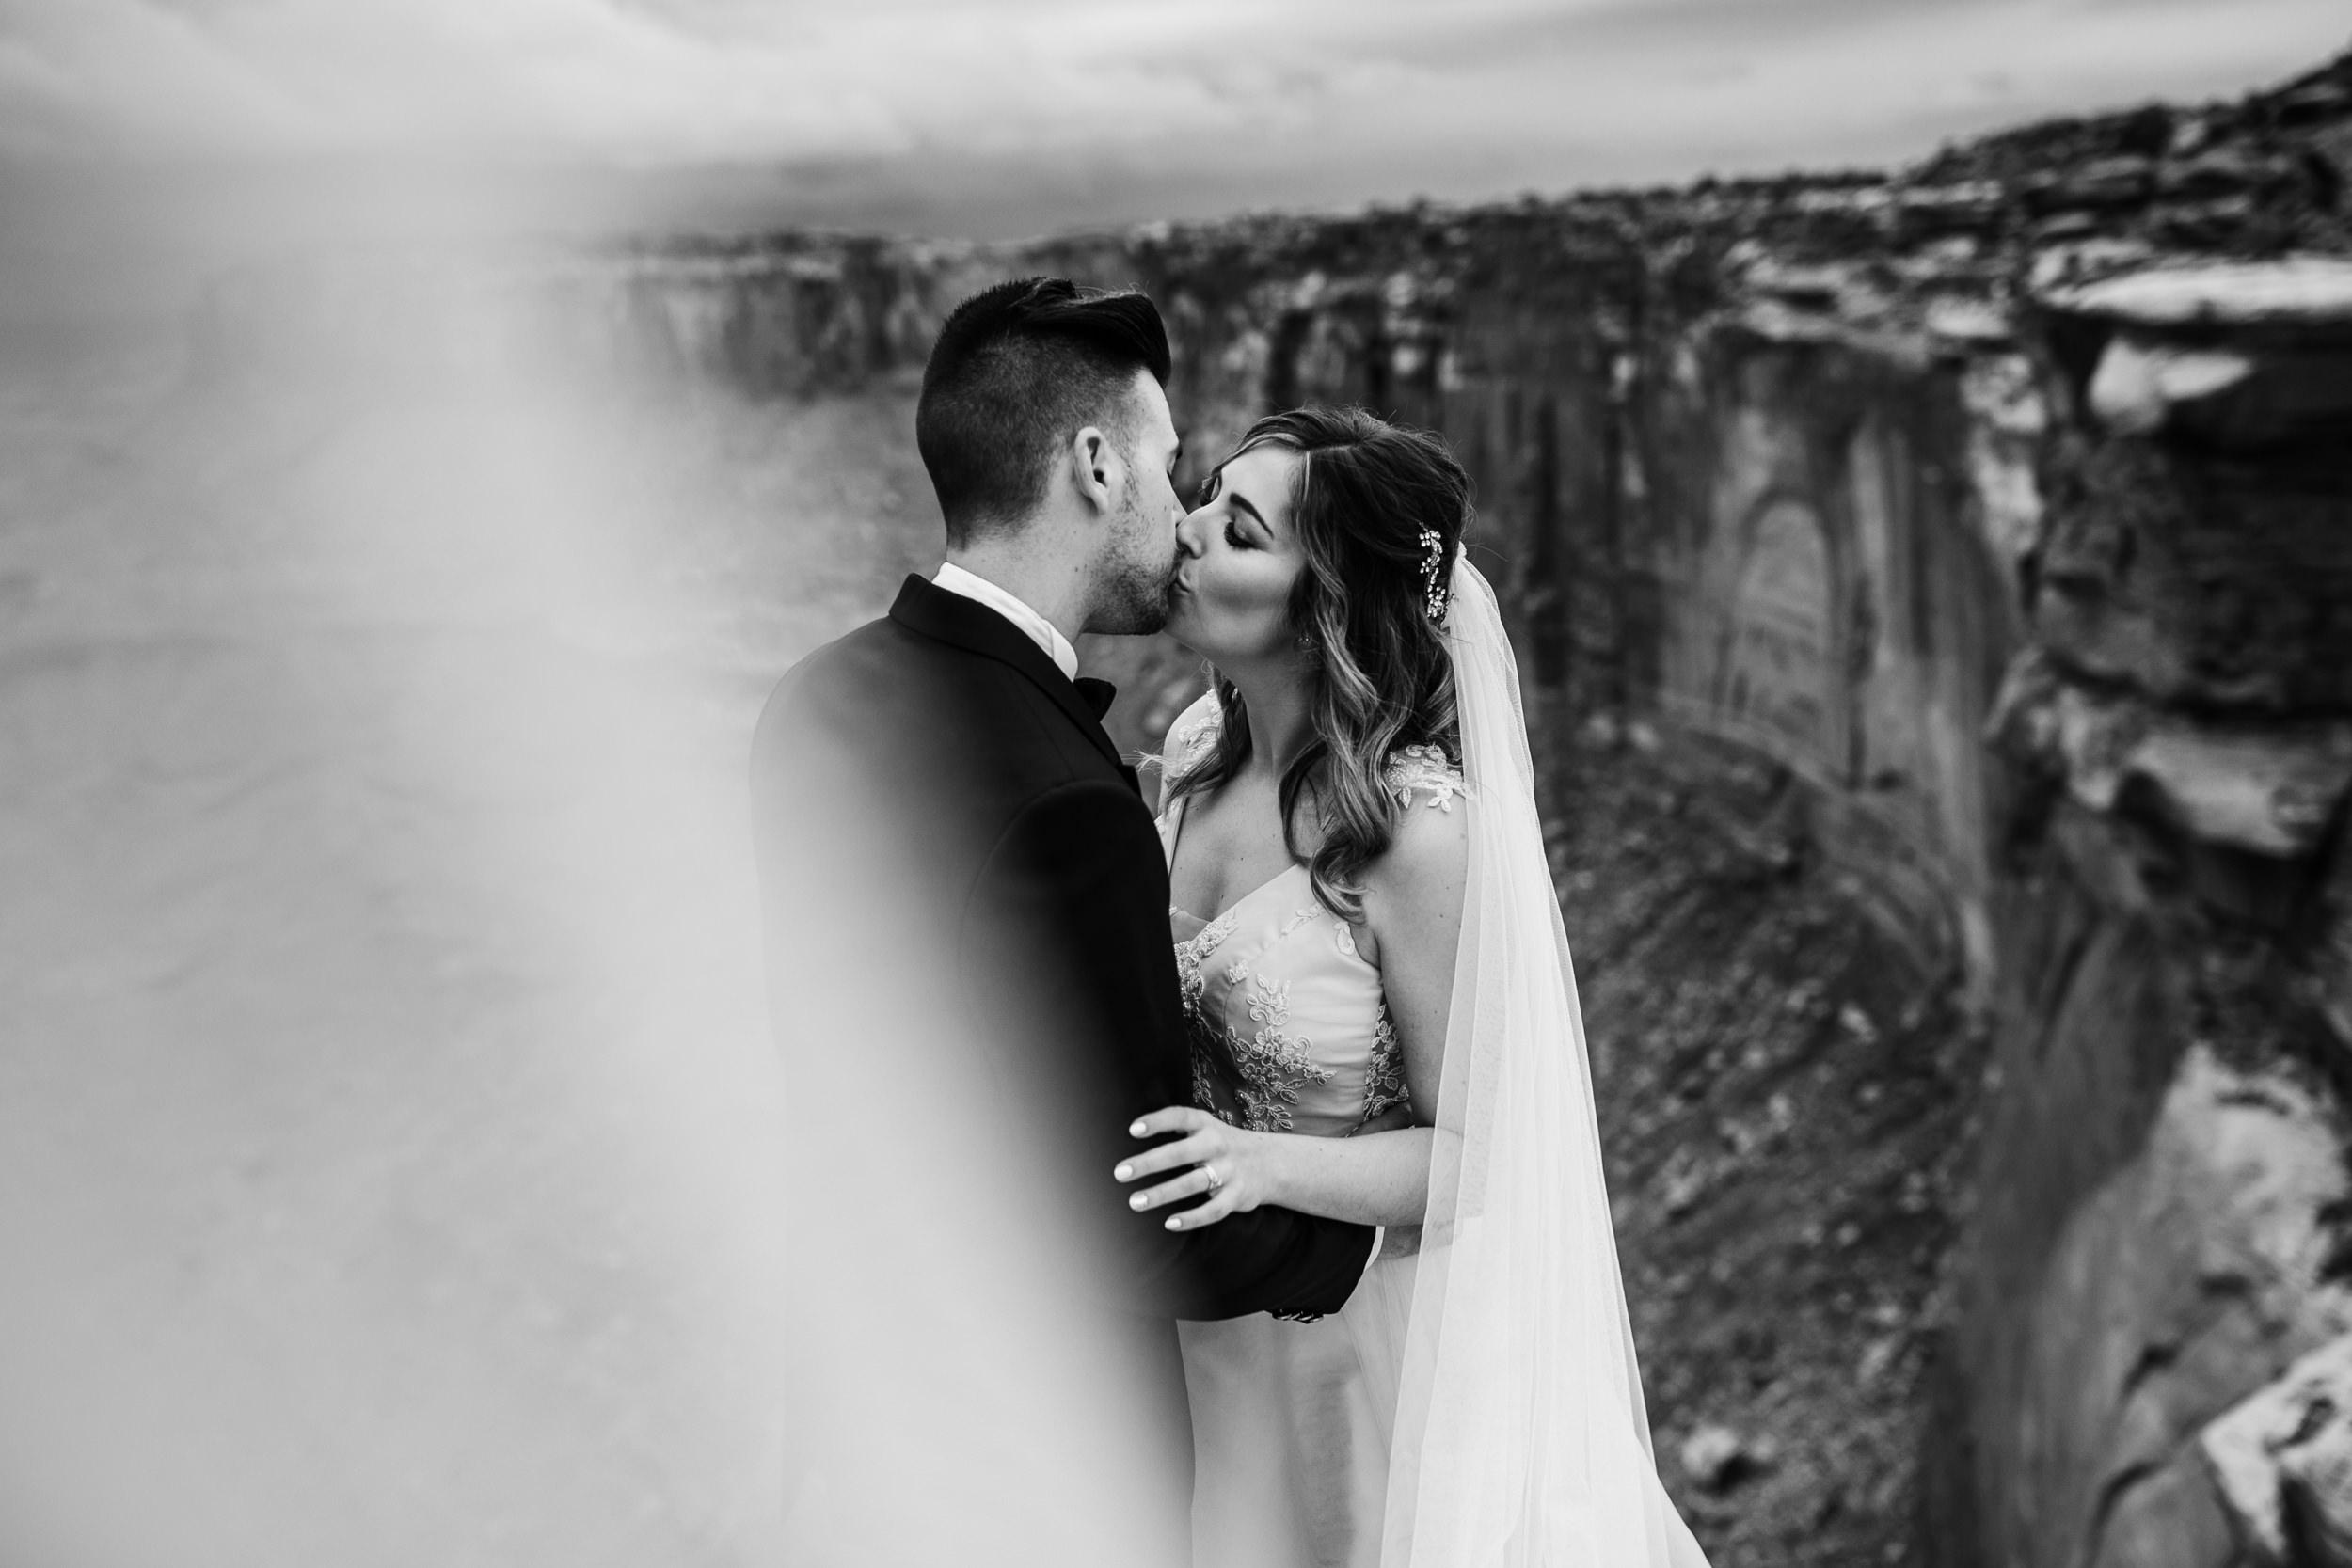 Hearnes-Elopement-Photography-Canyonlands-National-Park-Moab-Wedding-22.jpg